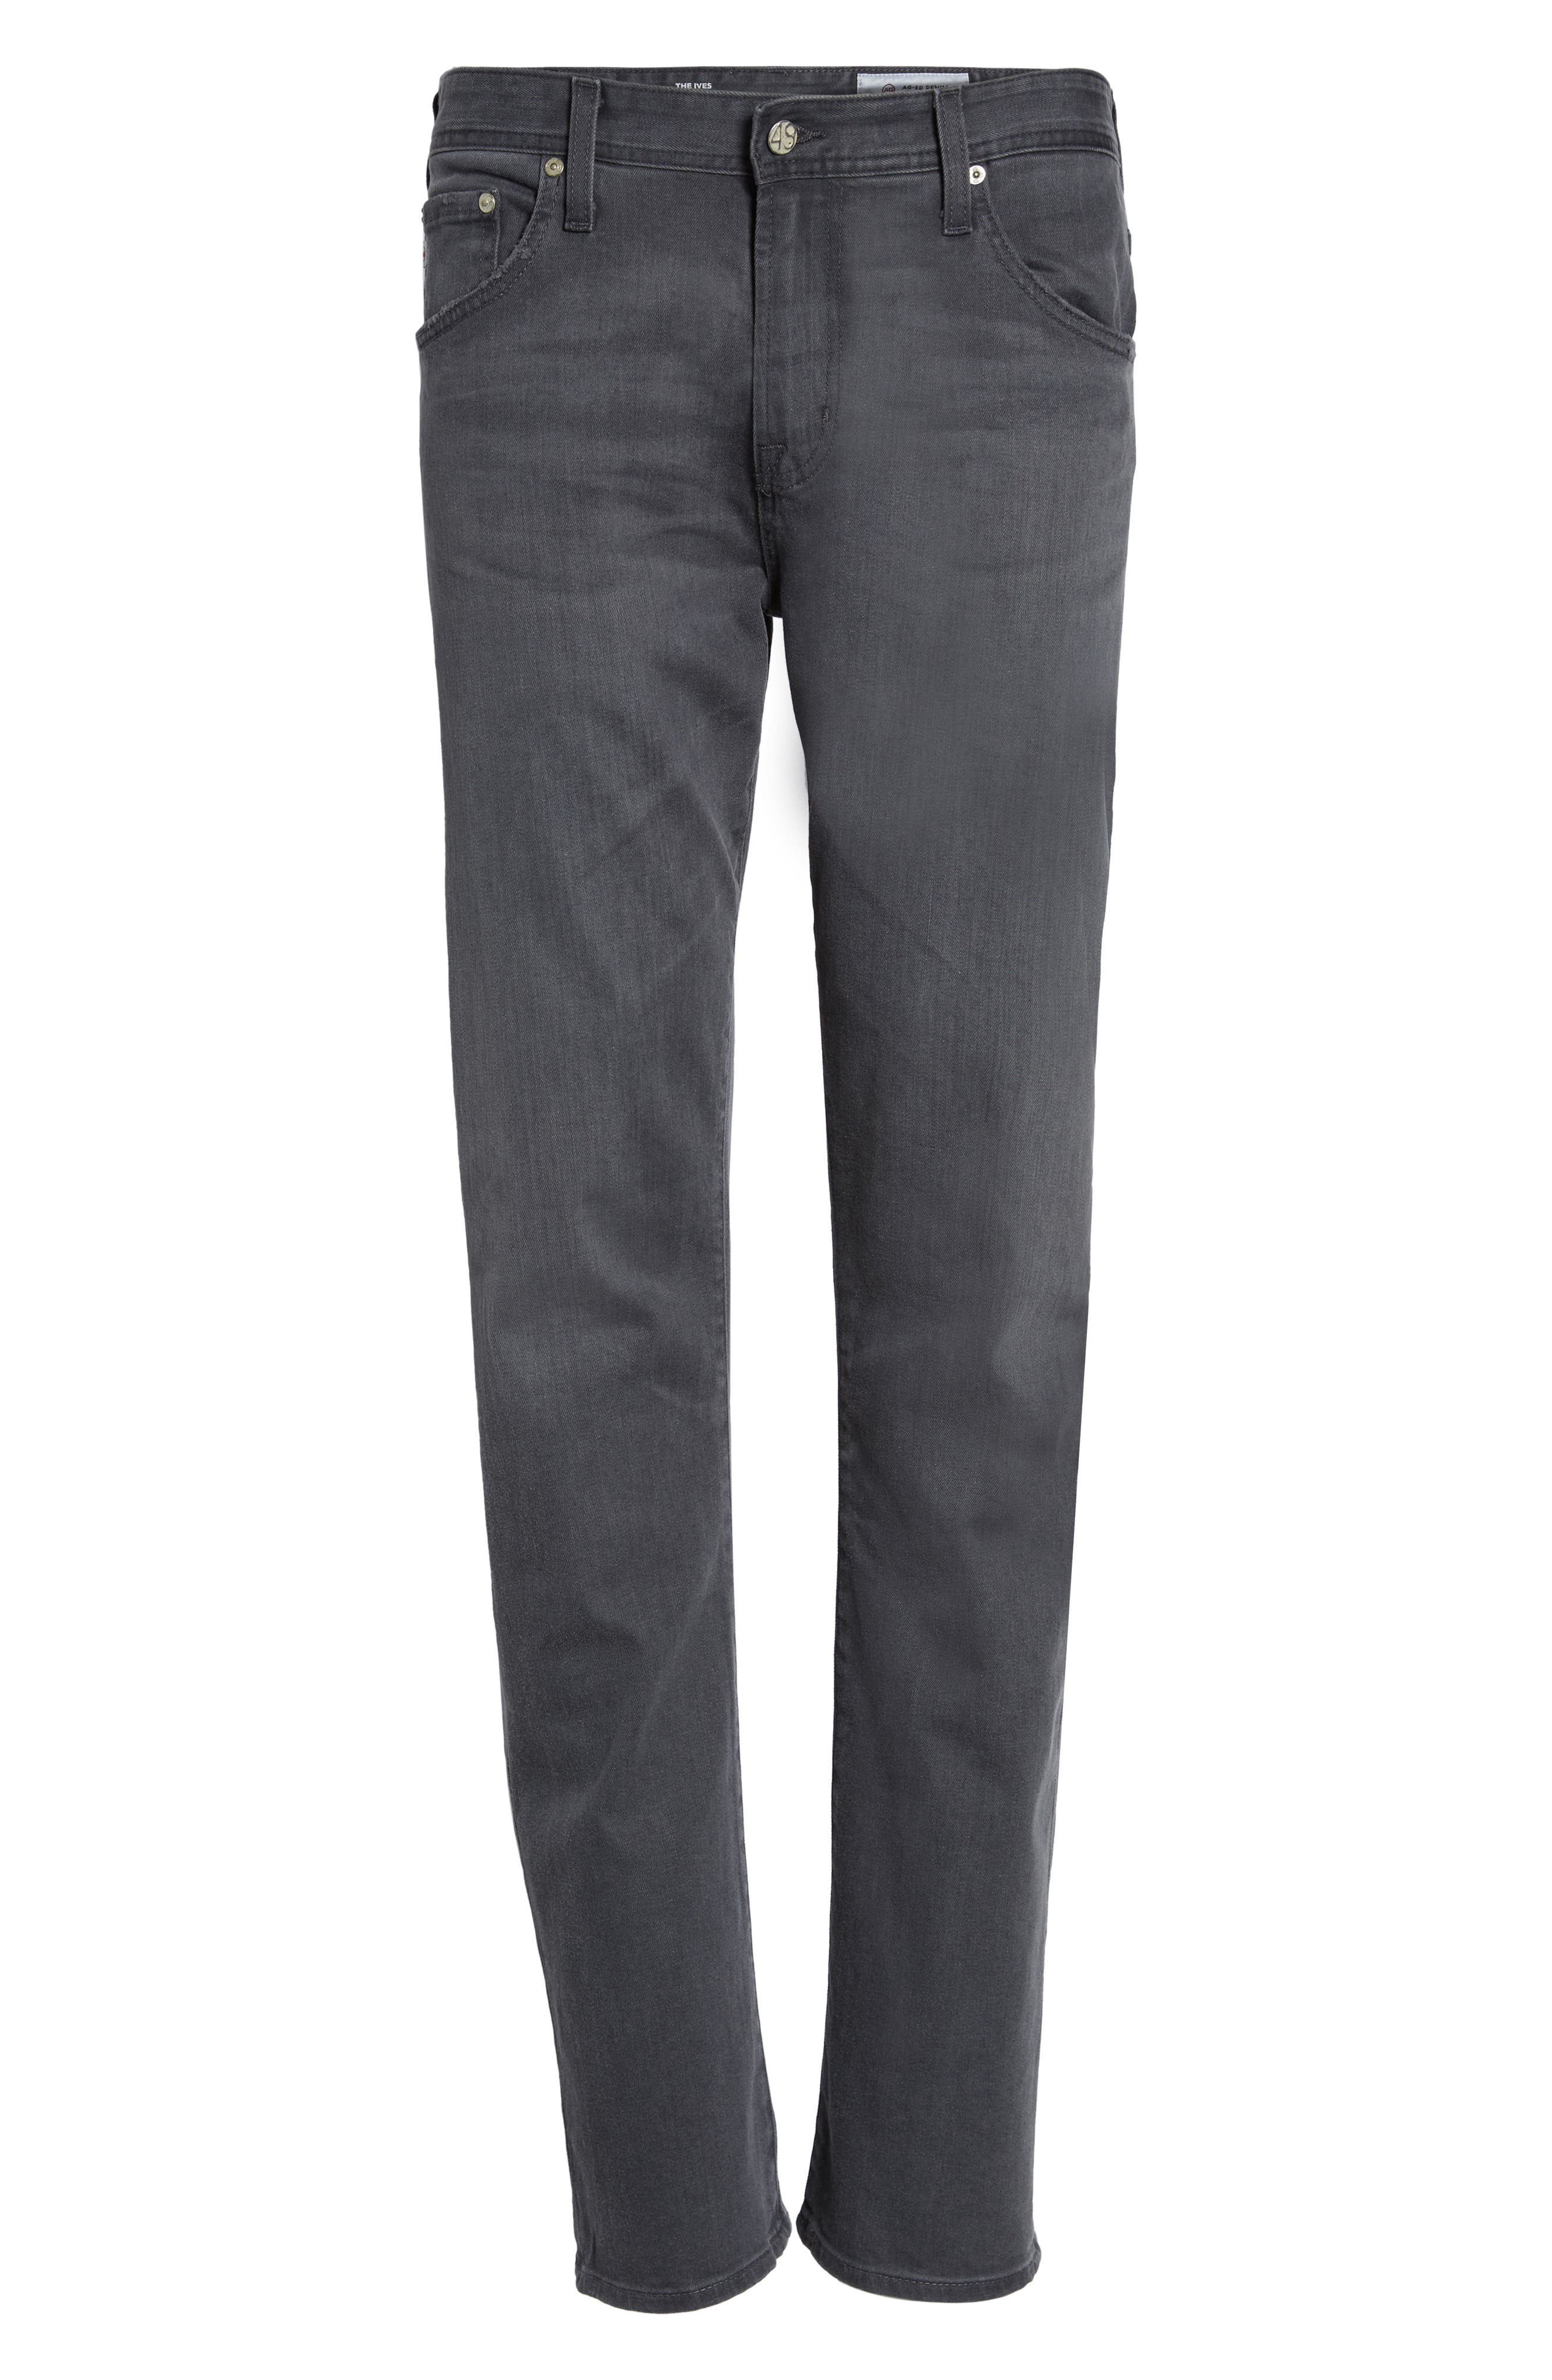 Ives Straight Leg Jeans,                             Alternate thumbnail 6, color,                             020